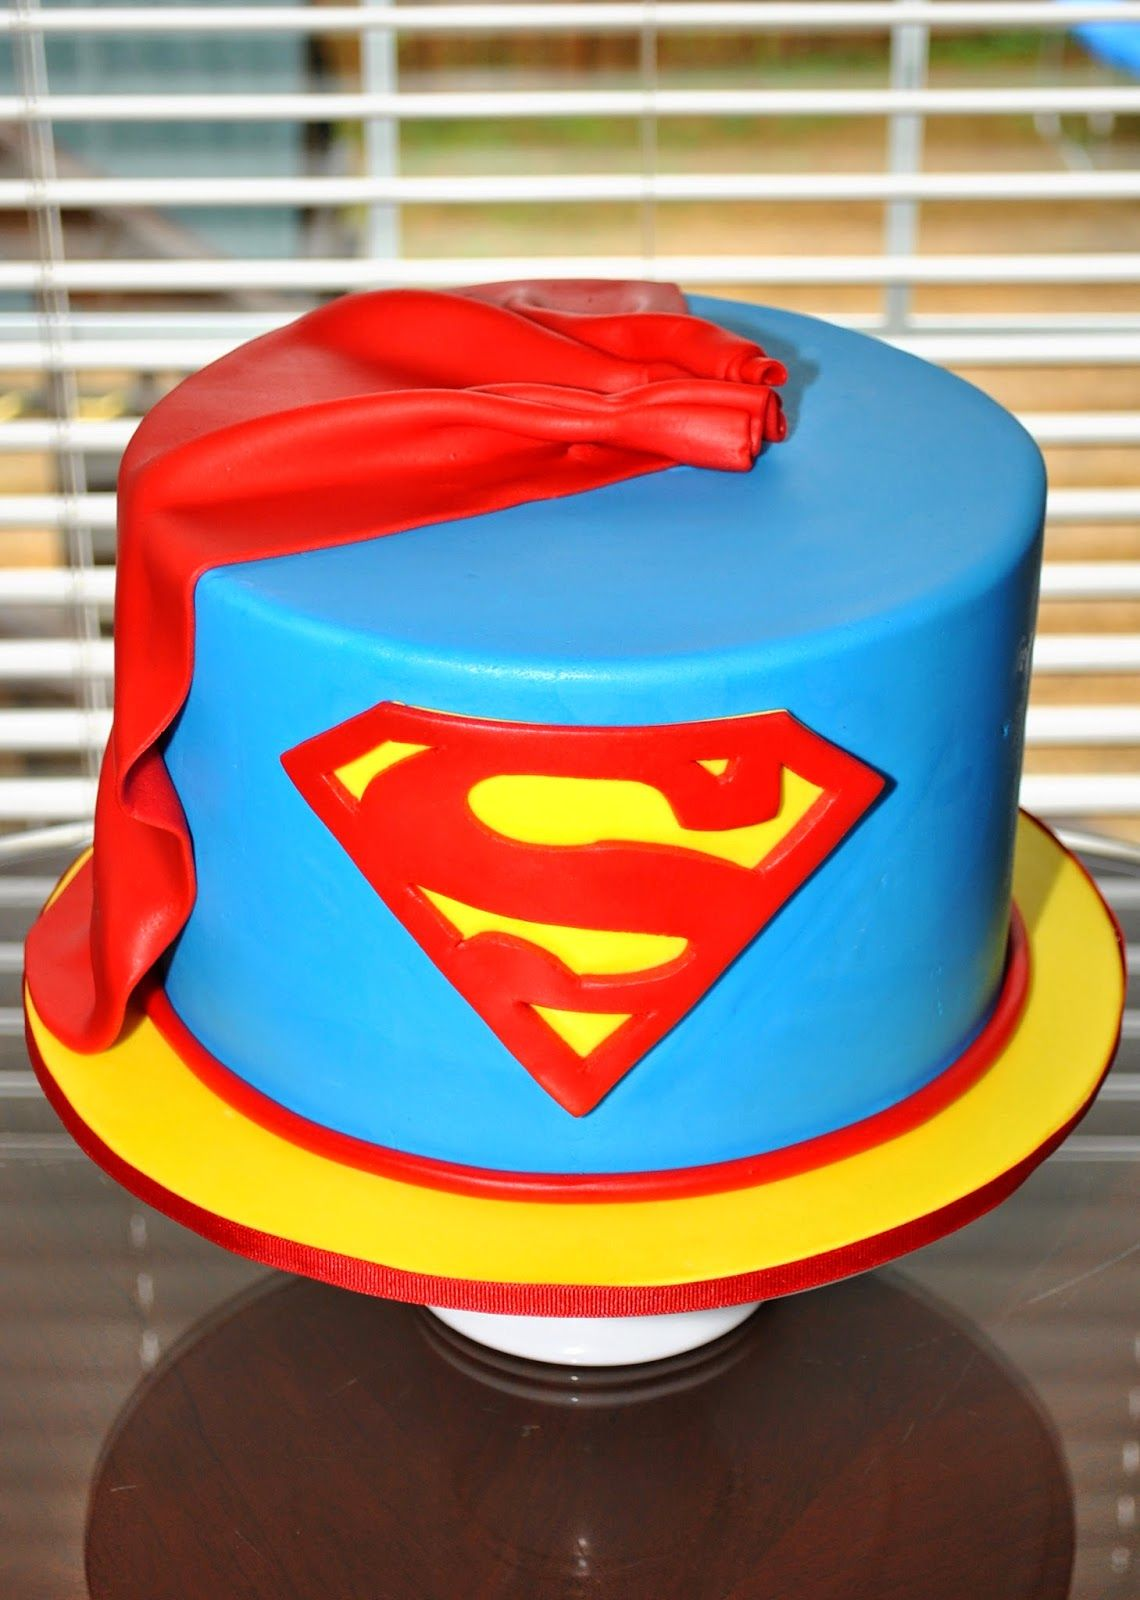 Superman cake Cake Ideas Pinterest Superman cakes Cake and